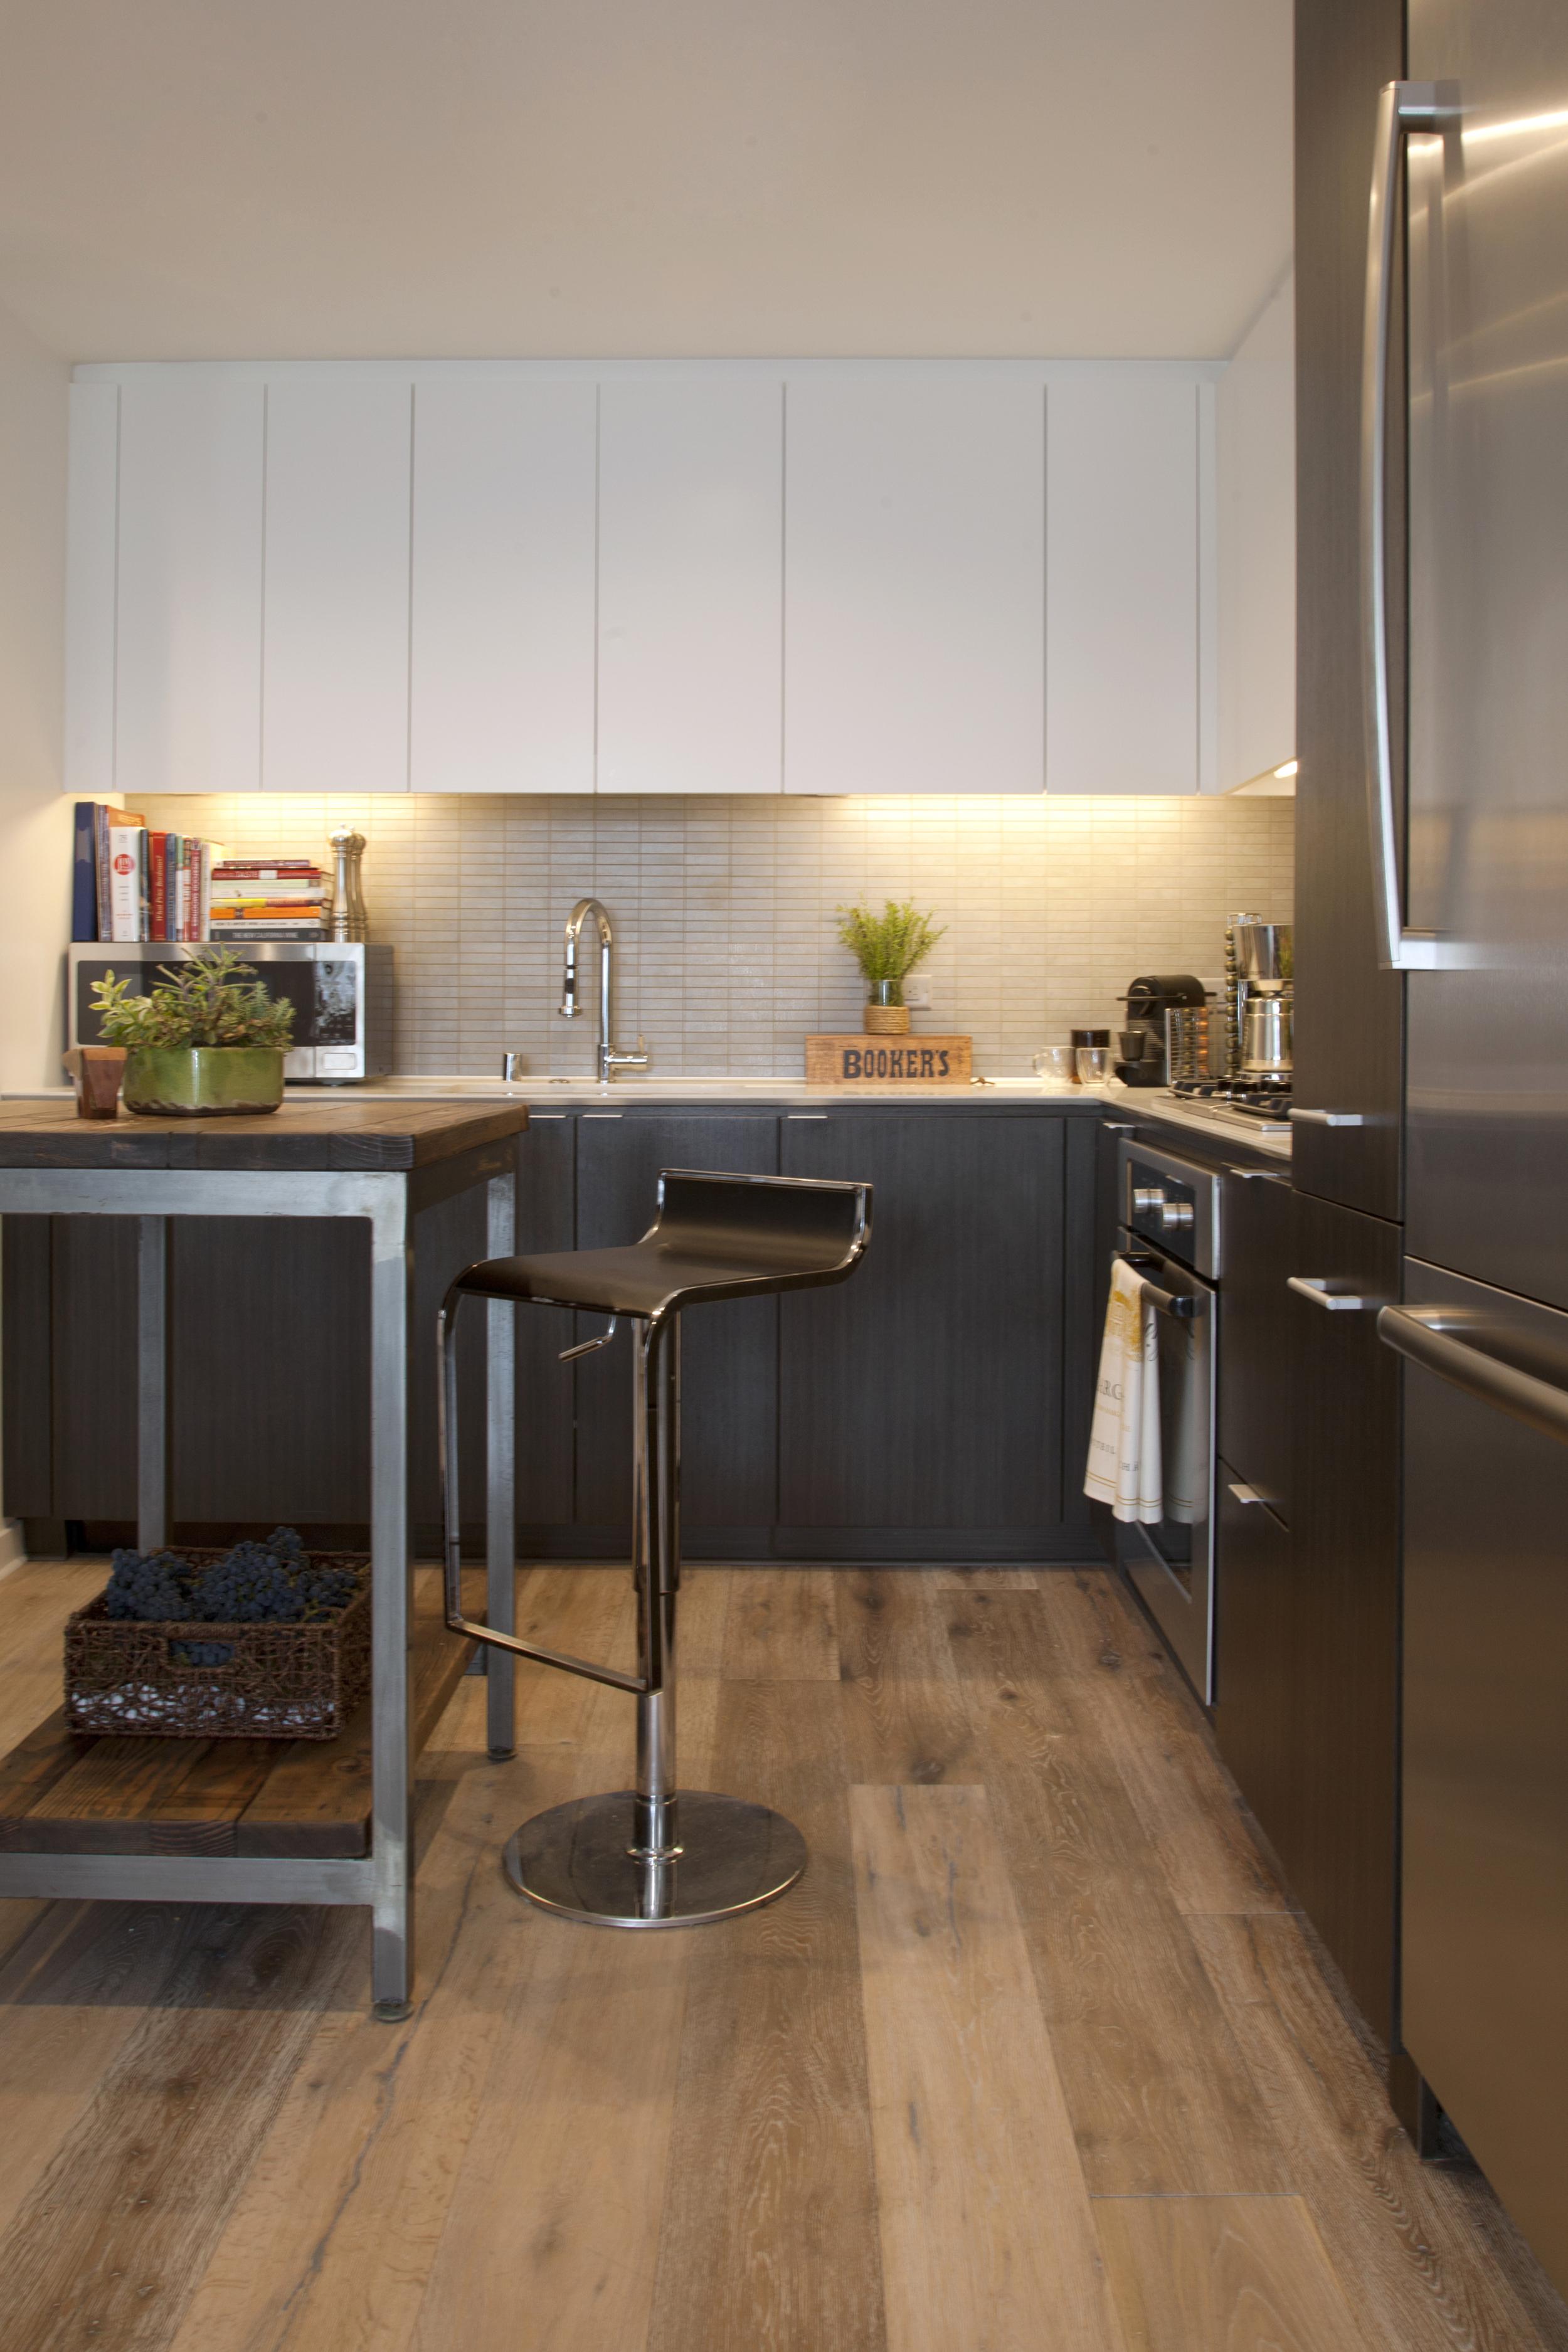 Modern white kitchen bar stools and cutting board island